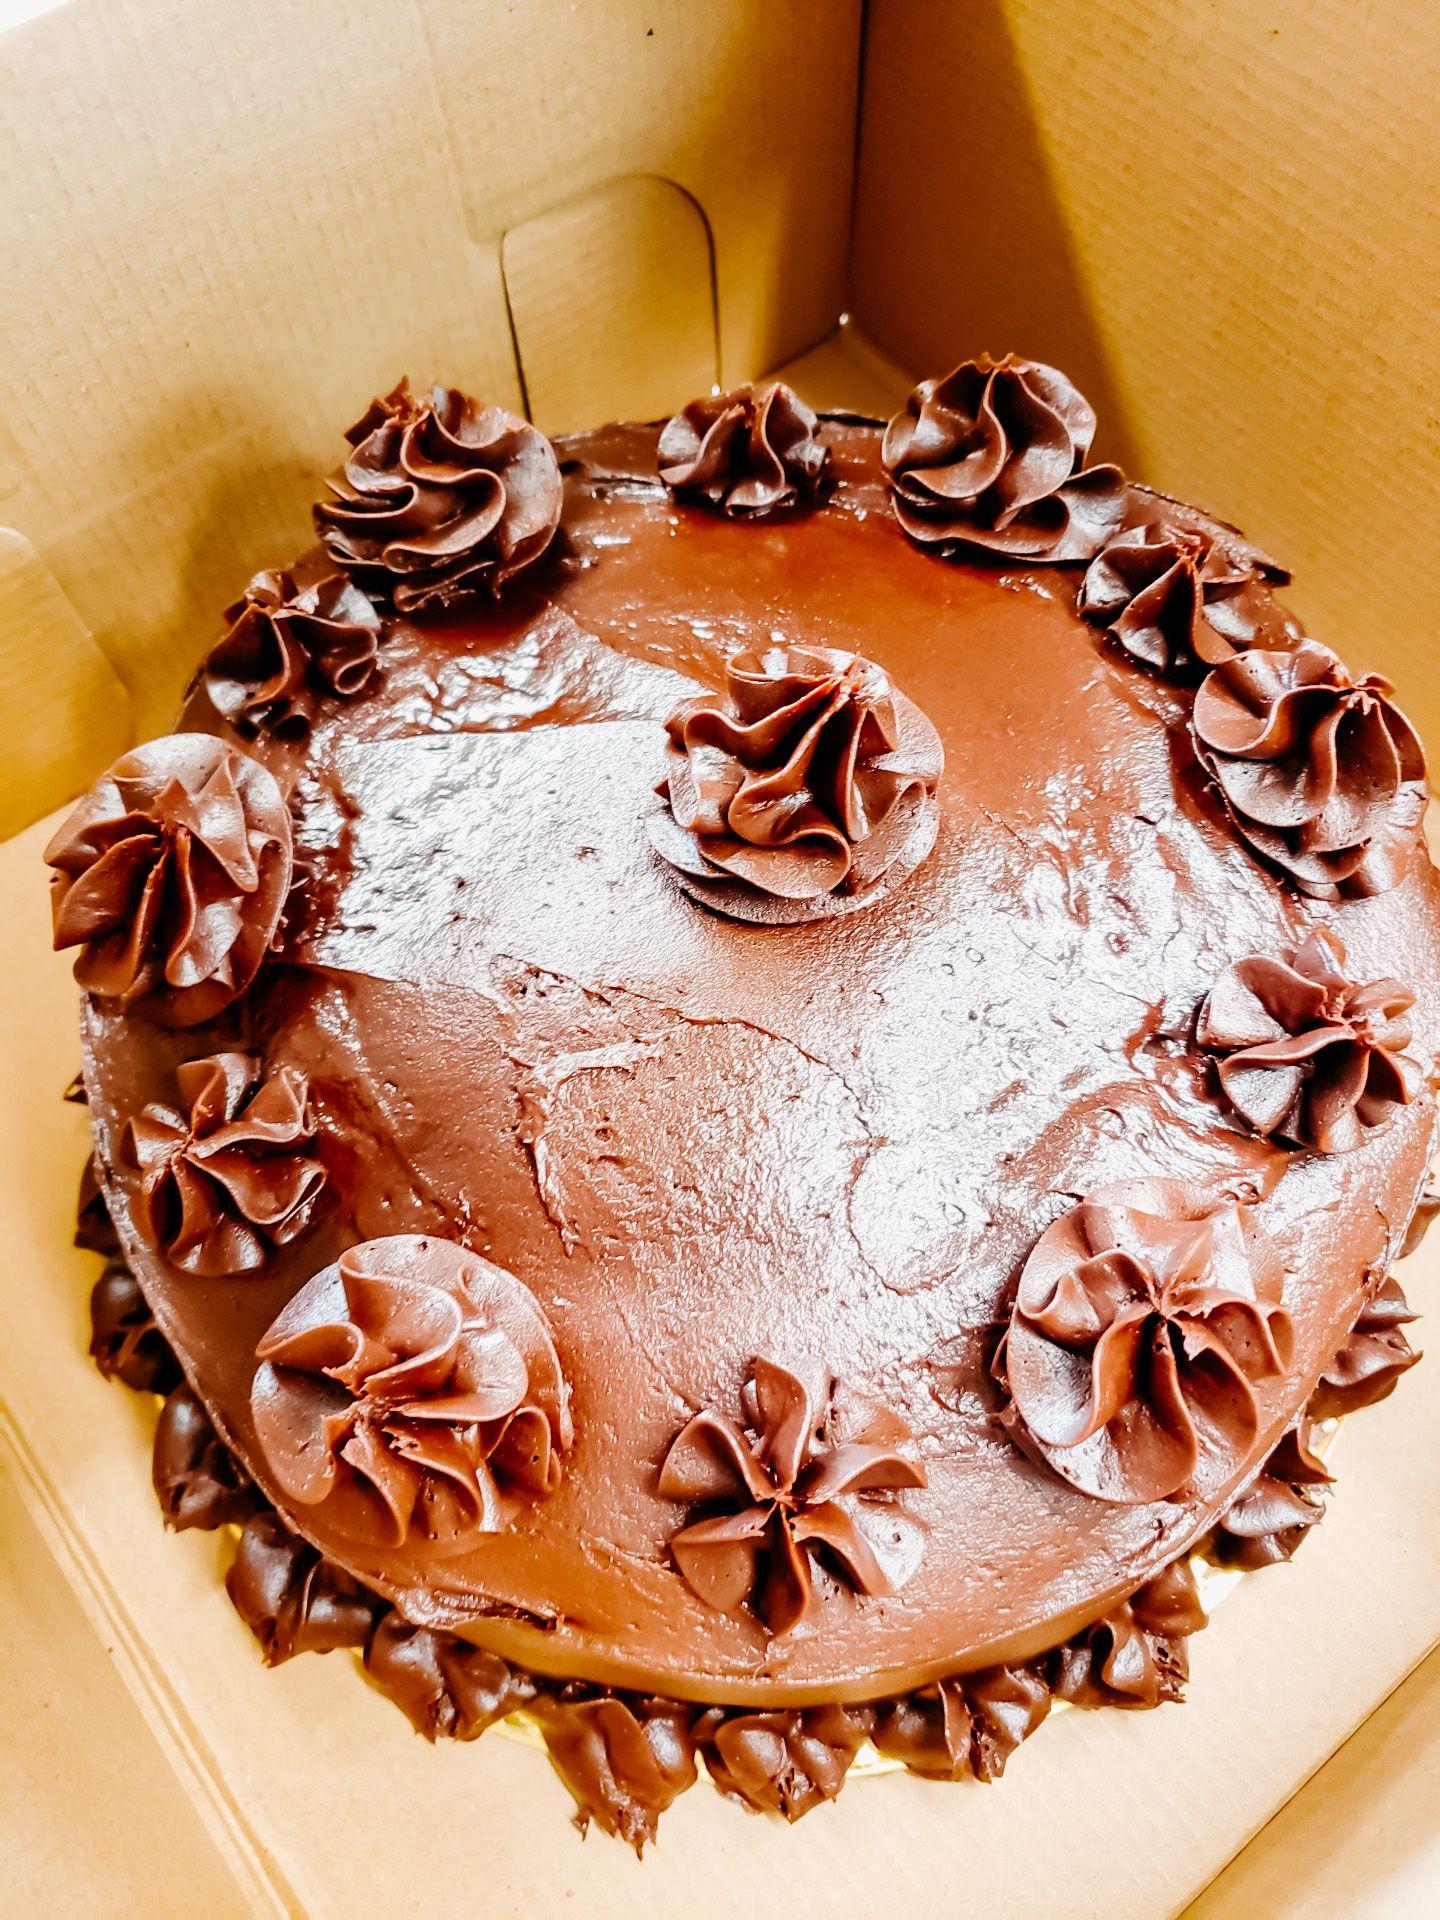 Doub choc cake ashford acres inn breakfast cupcakes